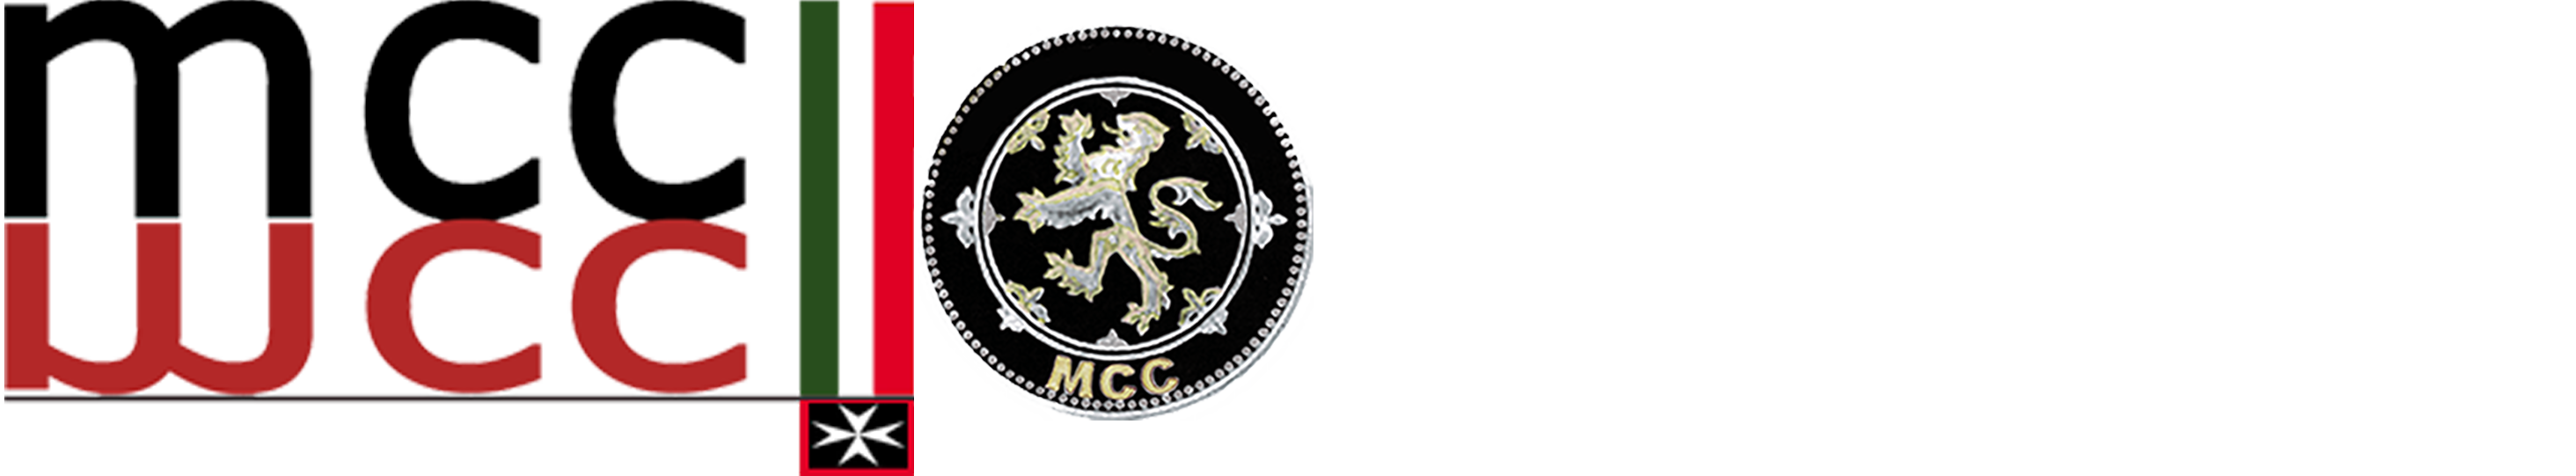 Mcccapitalgroup